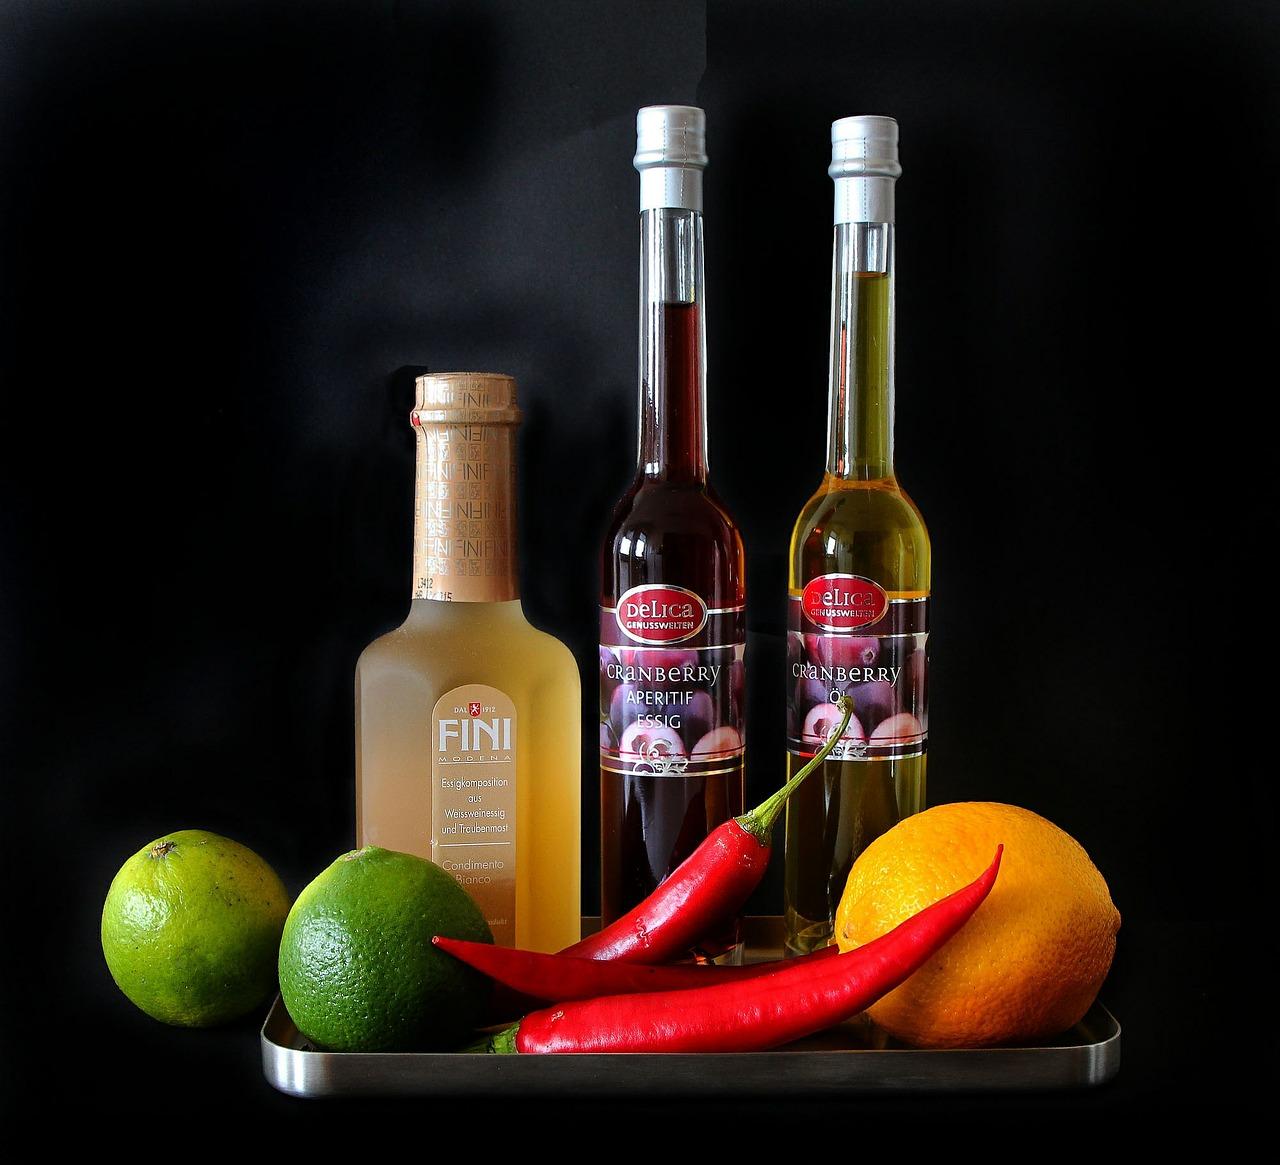 Enjuague de vinagre de sidra de manzana